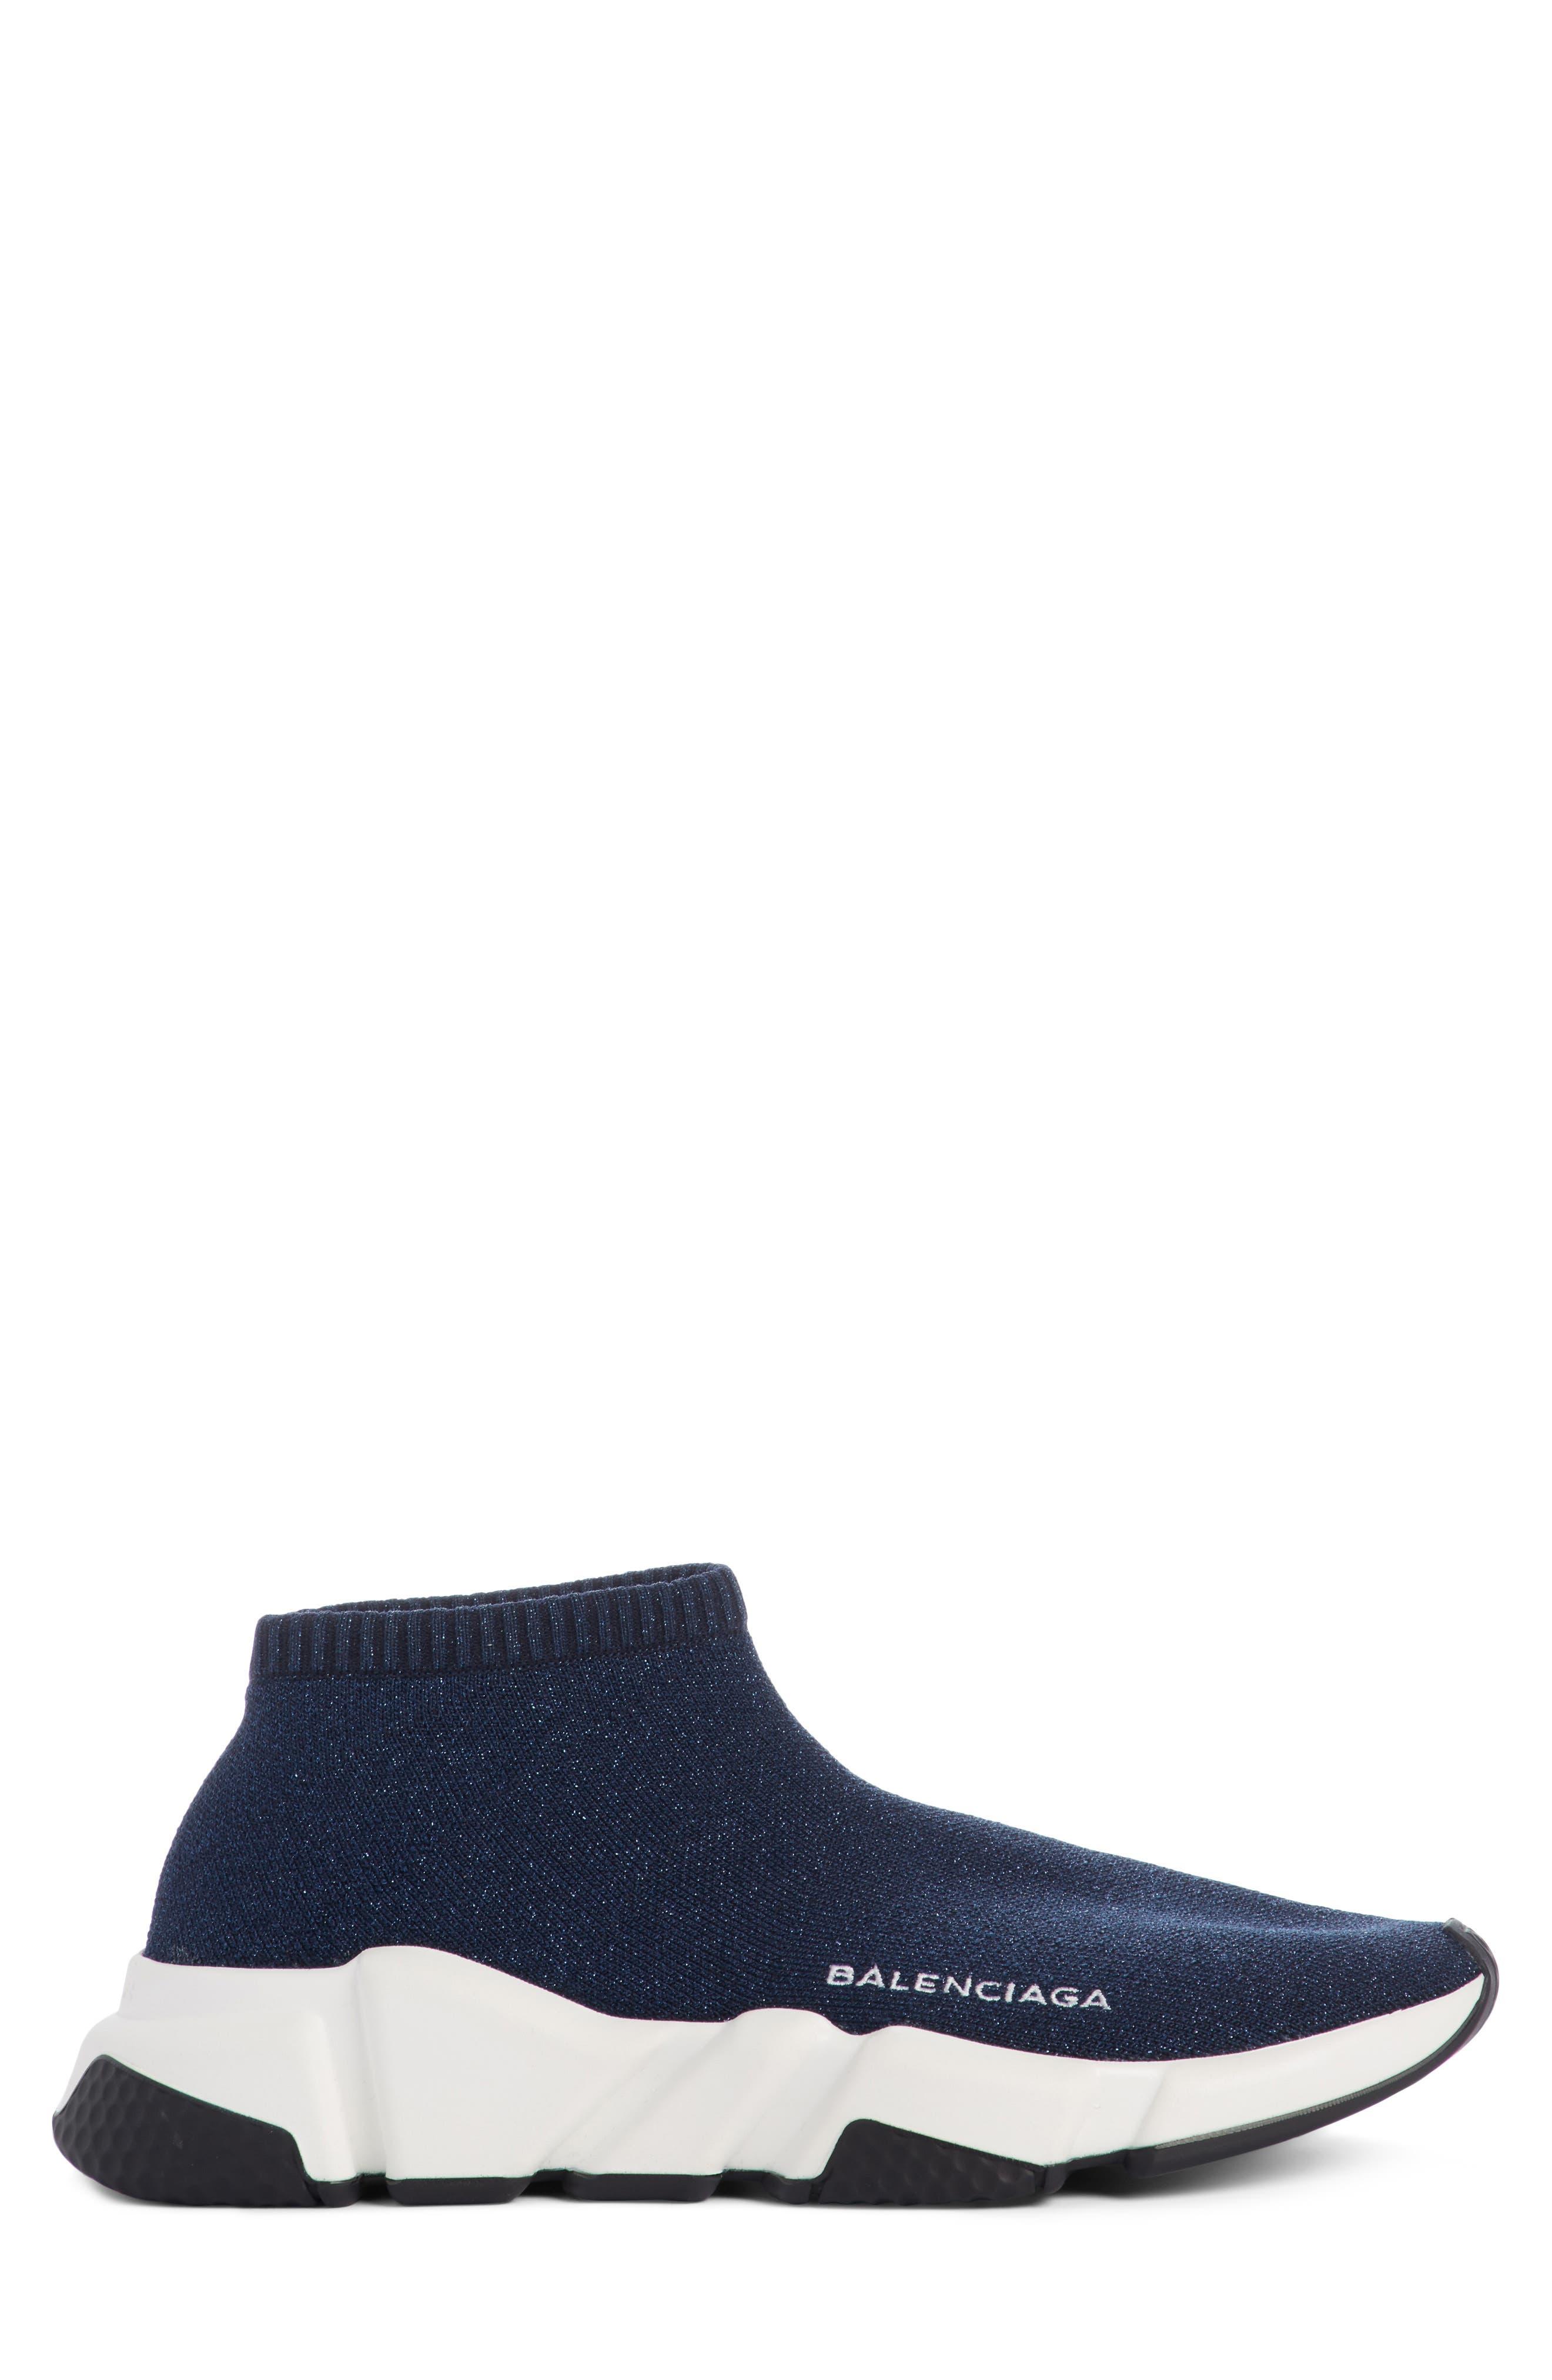 Alternate Image 3  - Balenciaga Low Speed Sneaker (Women)